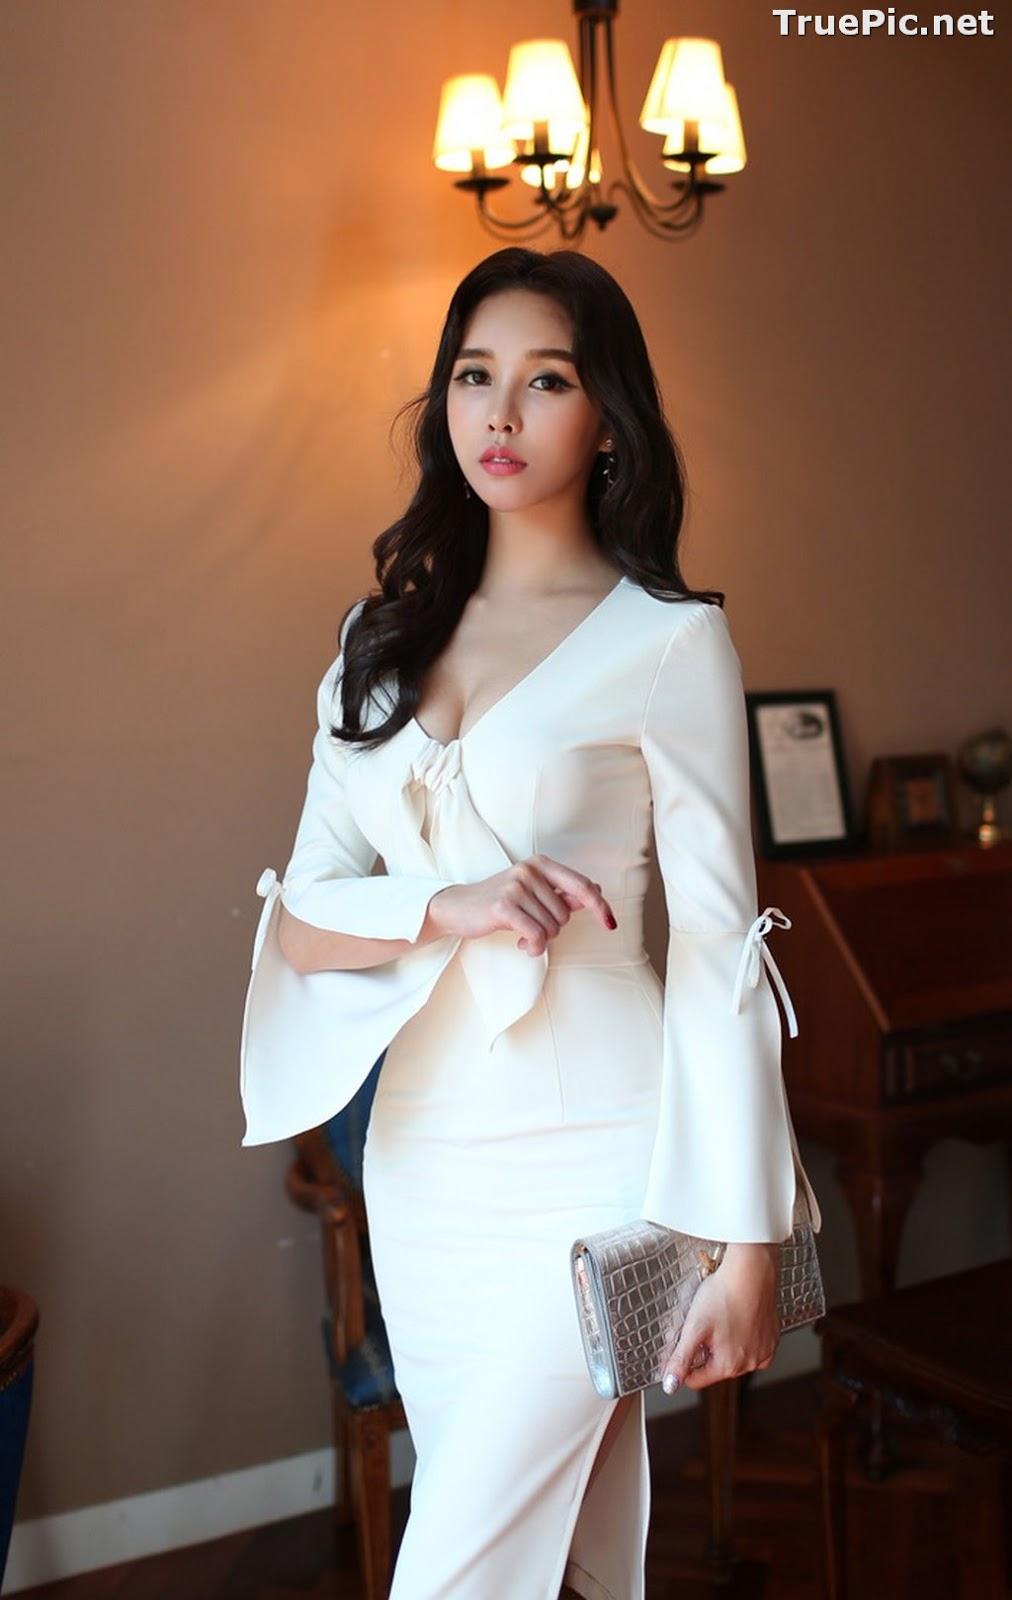 Image Korean Fashion Model - Chloe Kim - Fashion Photography Collection - TruePic.net - Picture-9